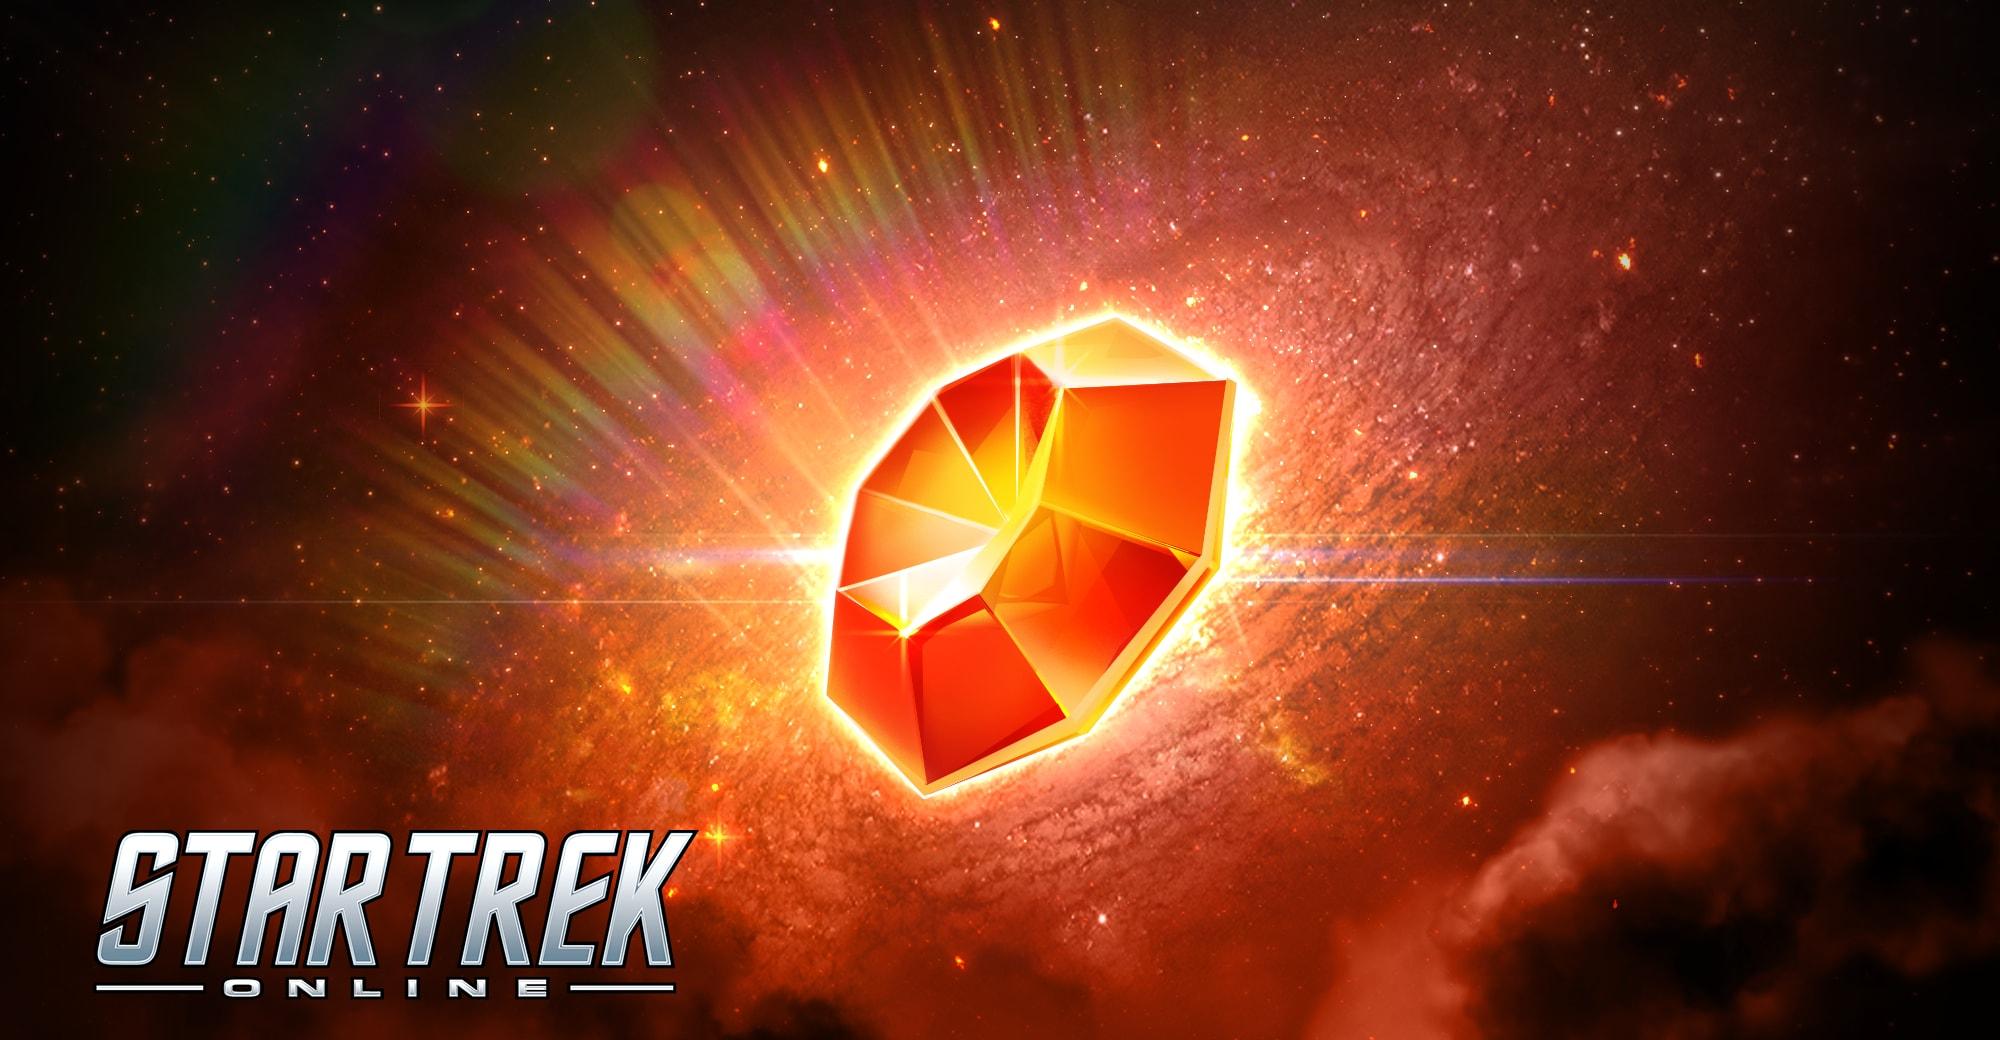 Star Trek Online : Corps de Défense Francophone - Portail 427cad1e693a1543a734231fcc73b9cf1560803228